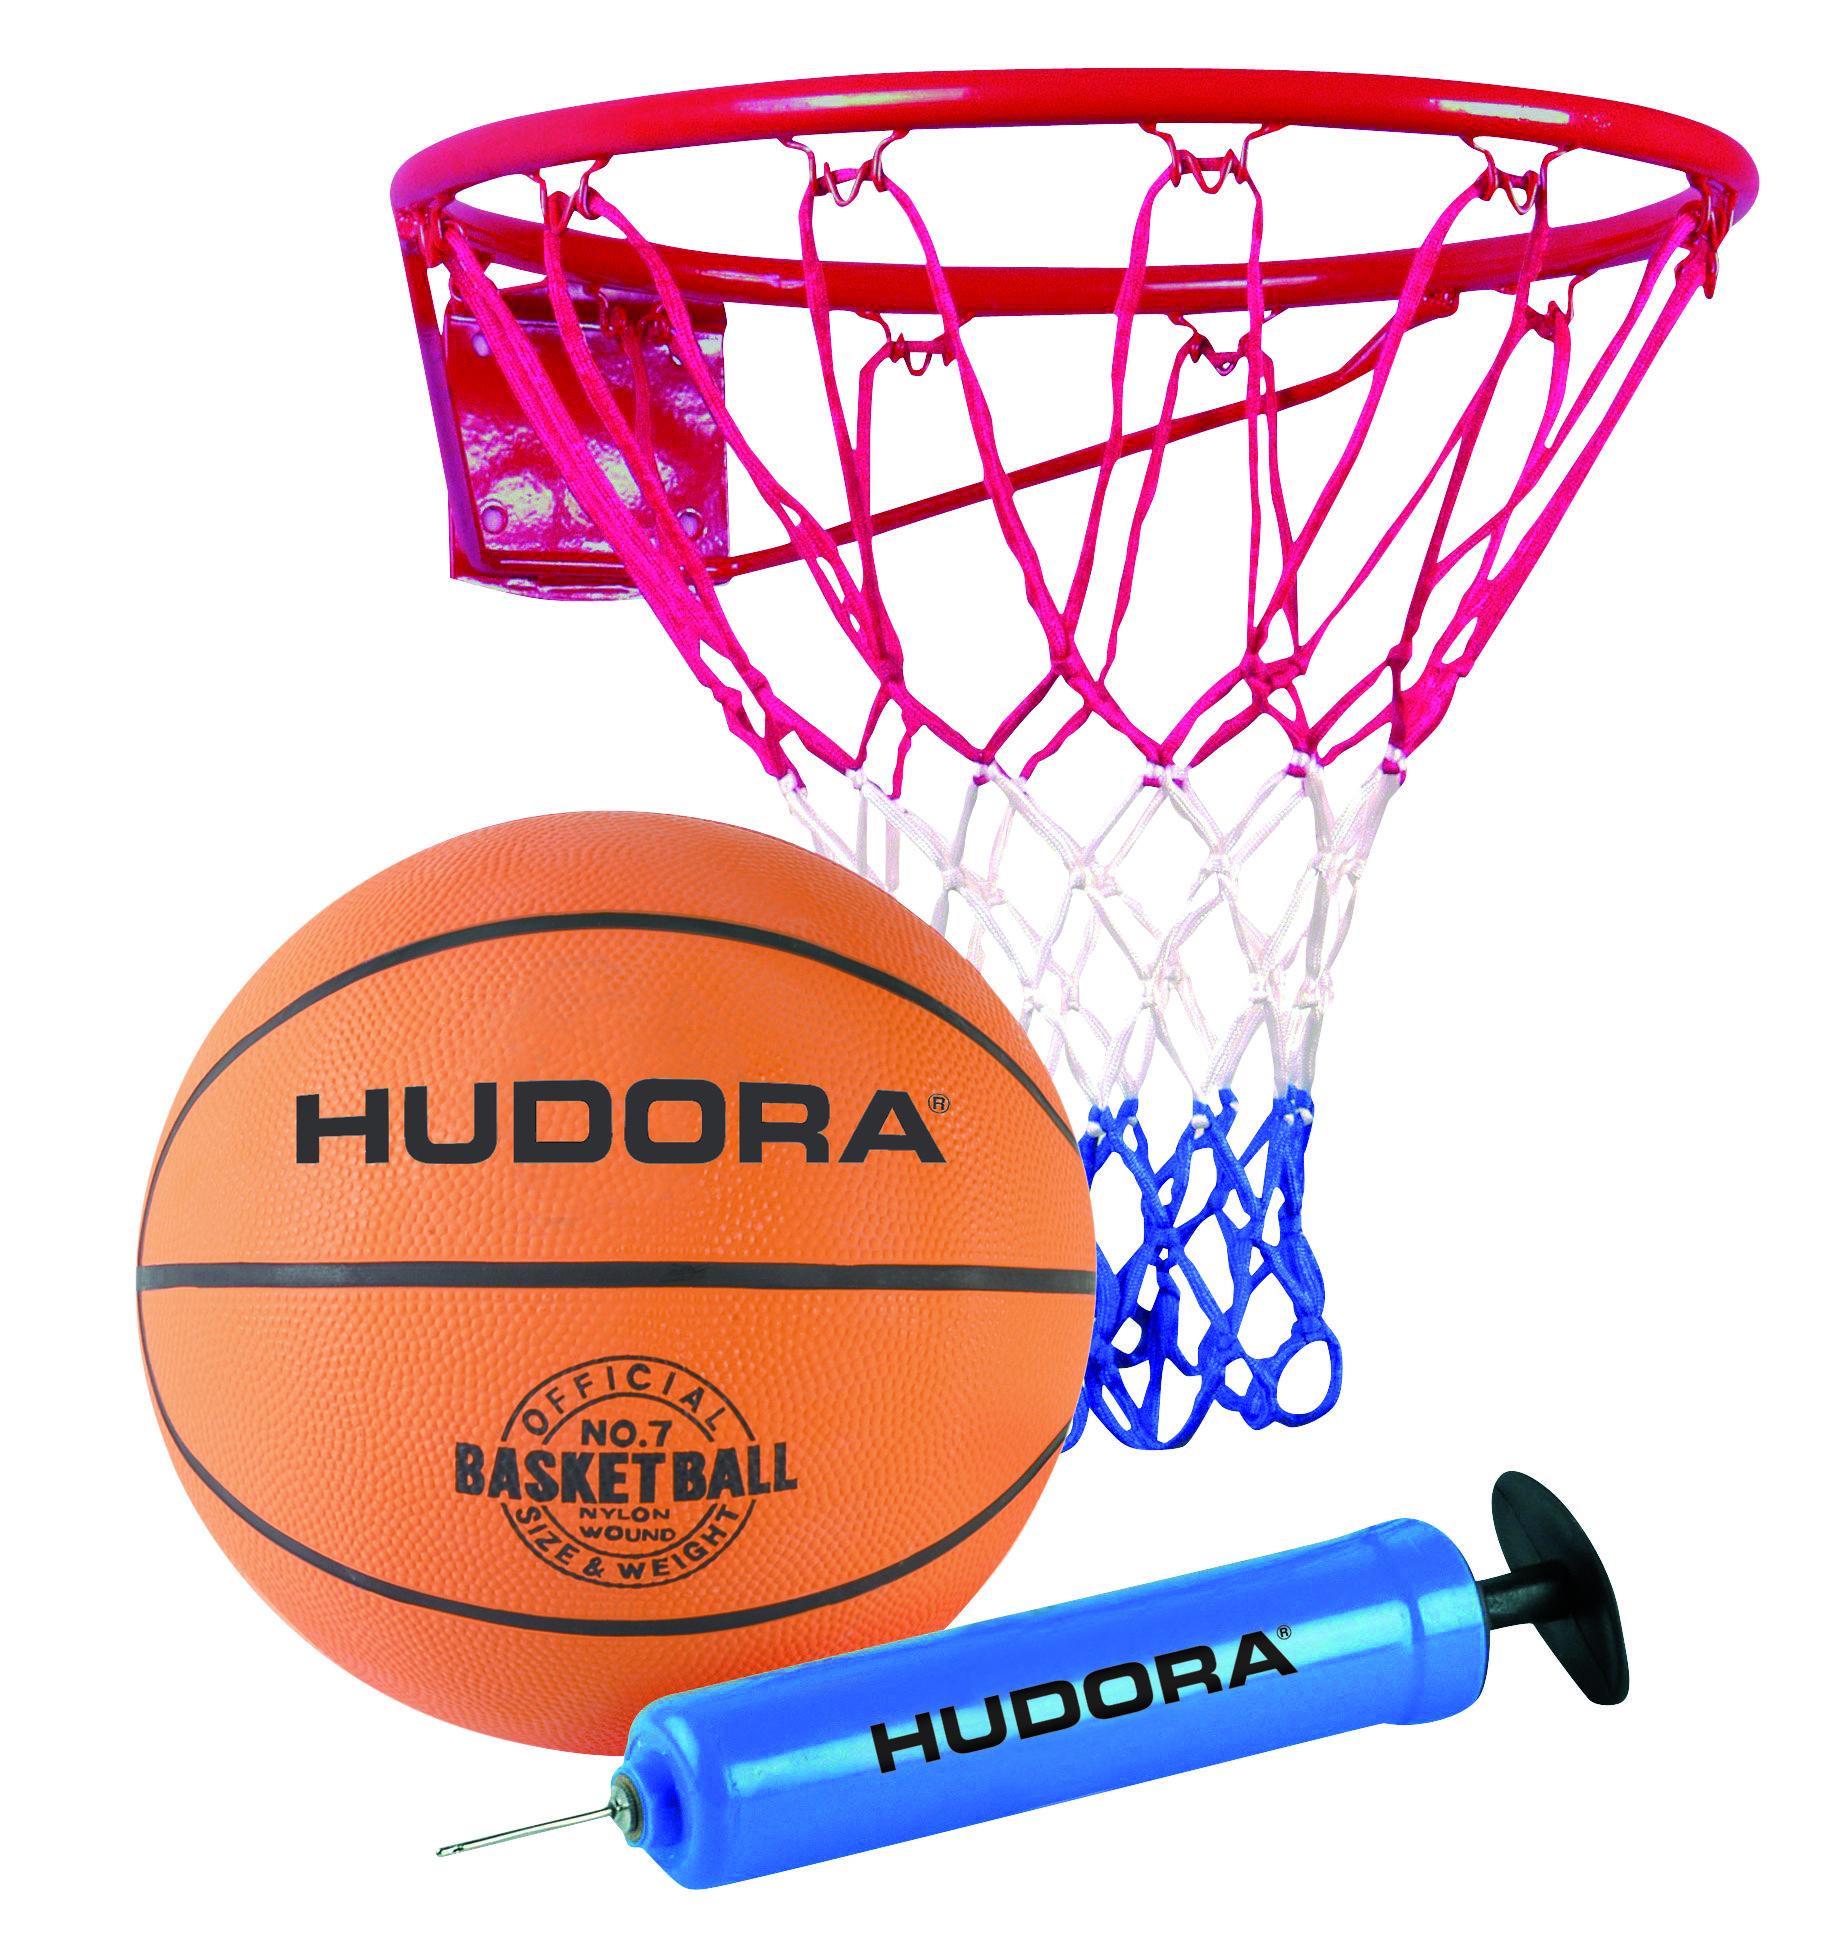 Hudora Basketball Set Slam it 3-teilig mit Korb und Pumpe Bild 1